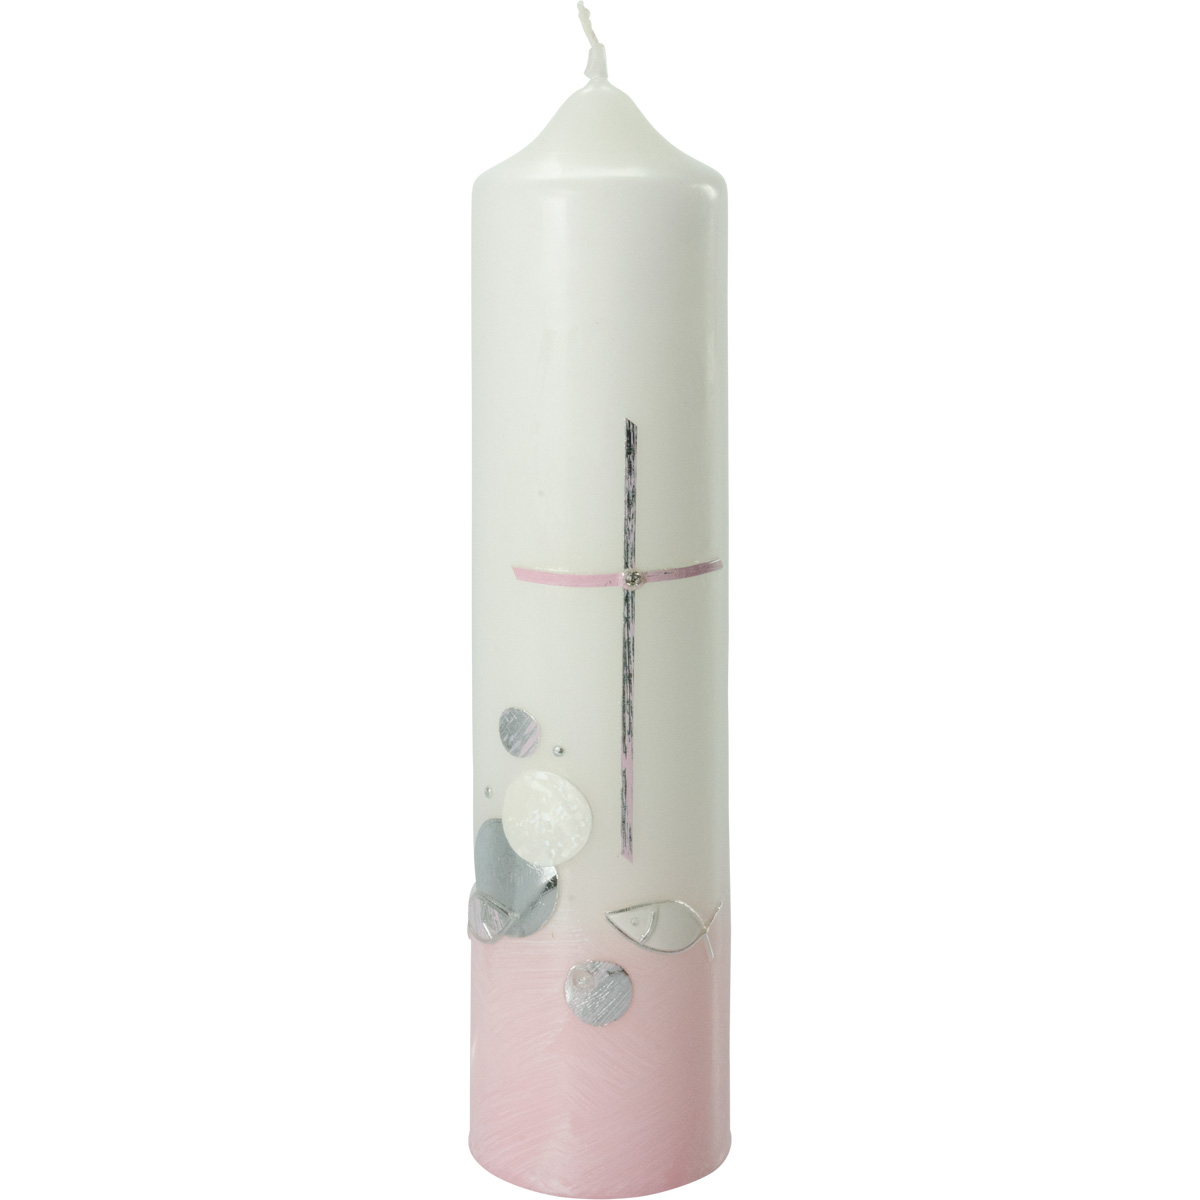 Taufkerze, #2072, Höhe=265mm, Ø=60mm, rosa, silber